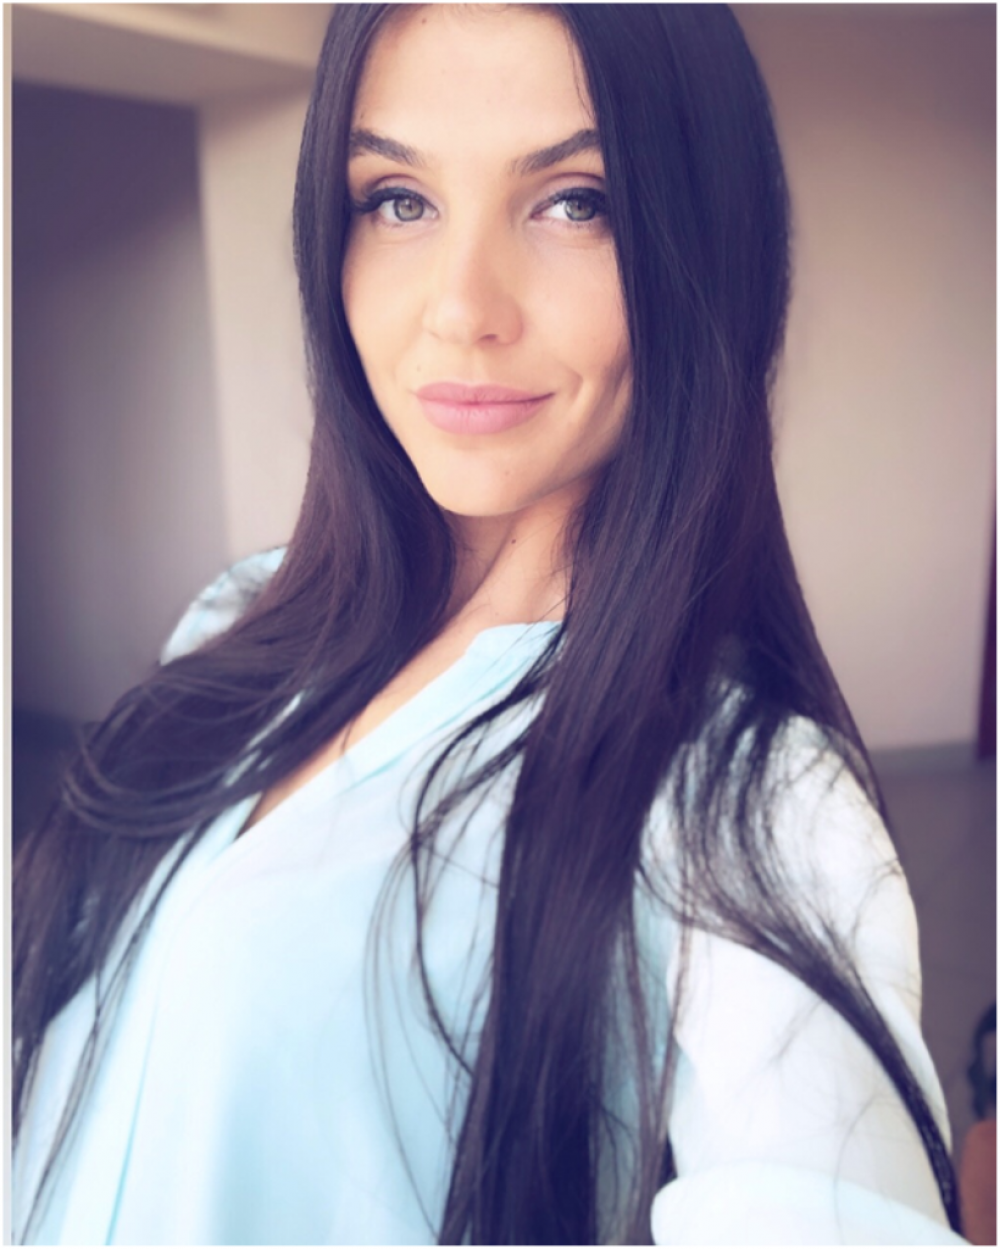 Ксения Тарасова, 28 лет. Менеджер ООО «Гармония». Хобби: спорт.